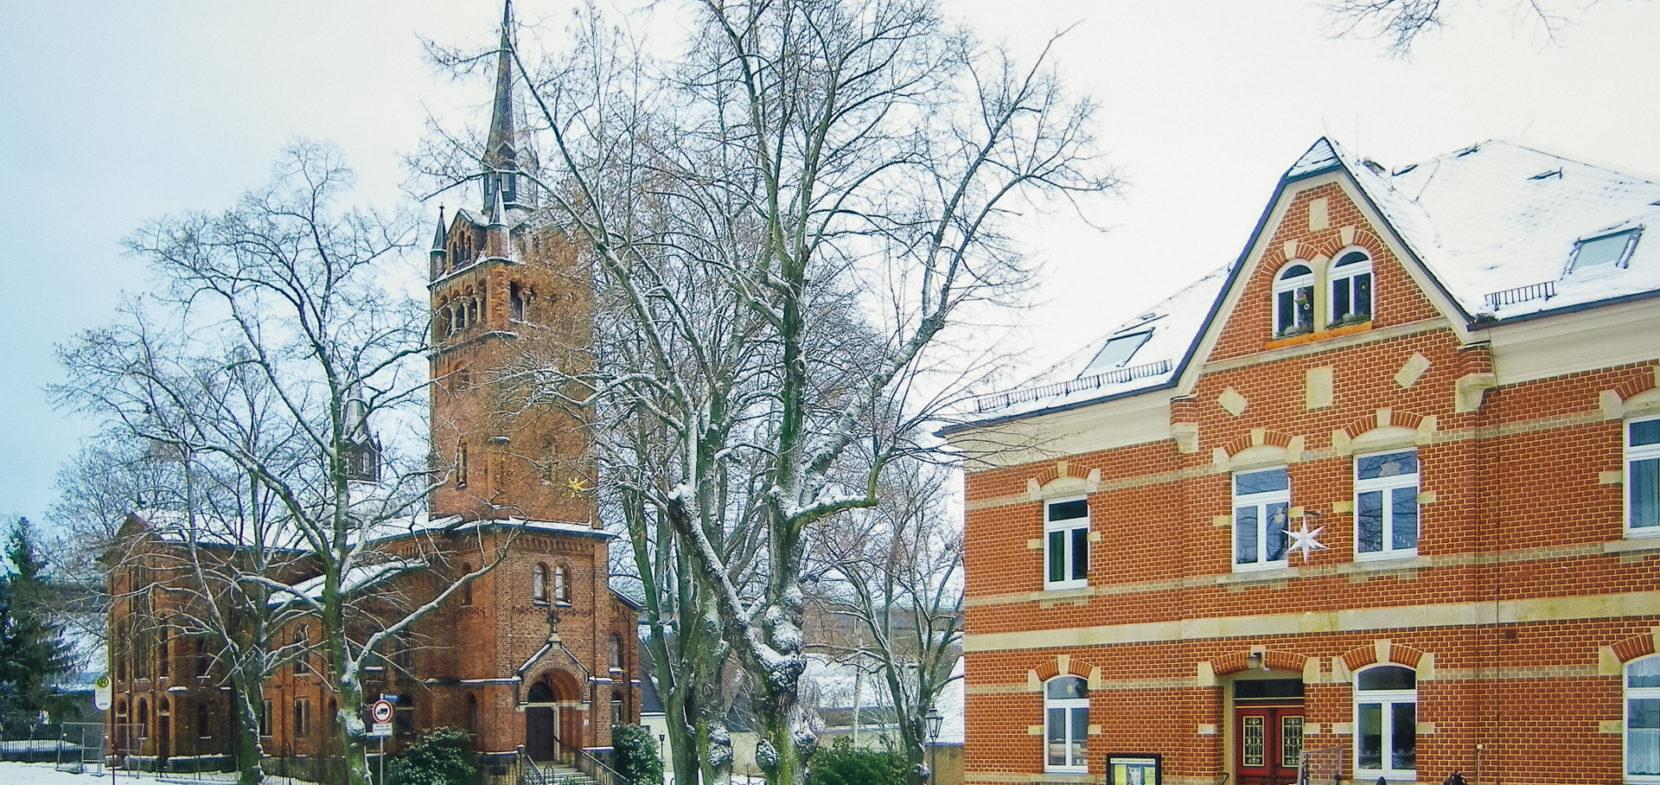 Wilkau-Haßlau – Lutherkirche